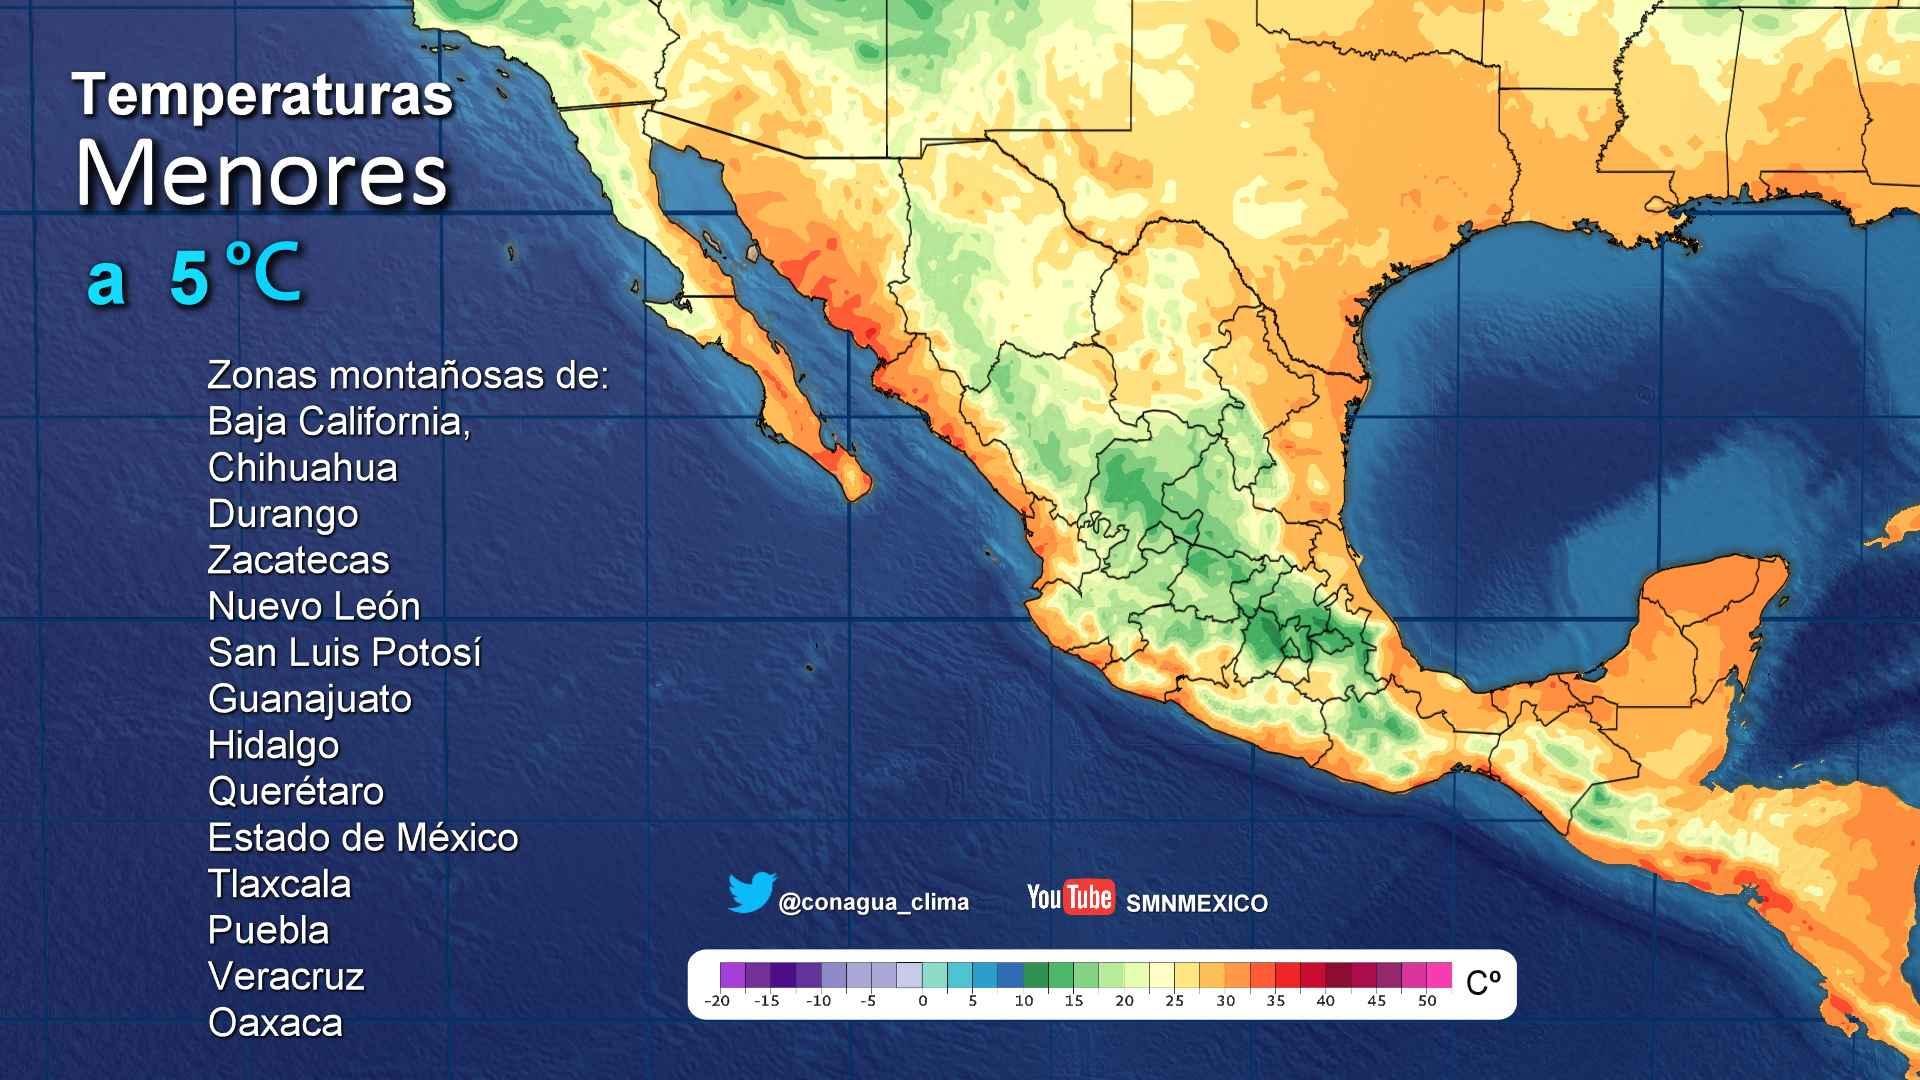 Prevalece el pronóstico de lluvias con intervalos de chubascos para Tlaxcala